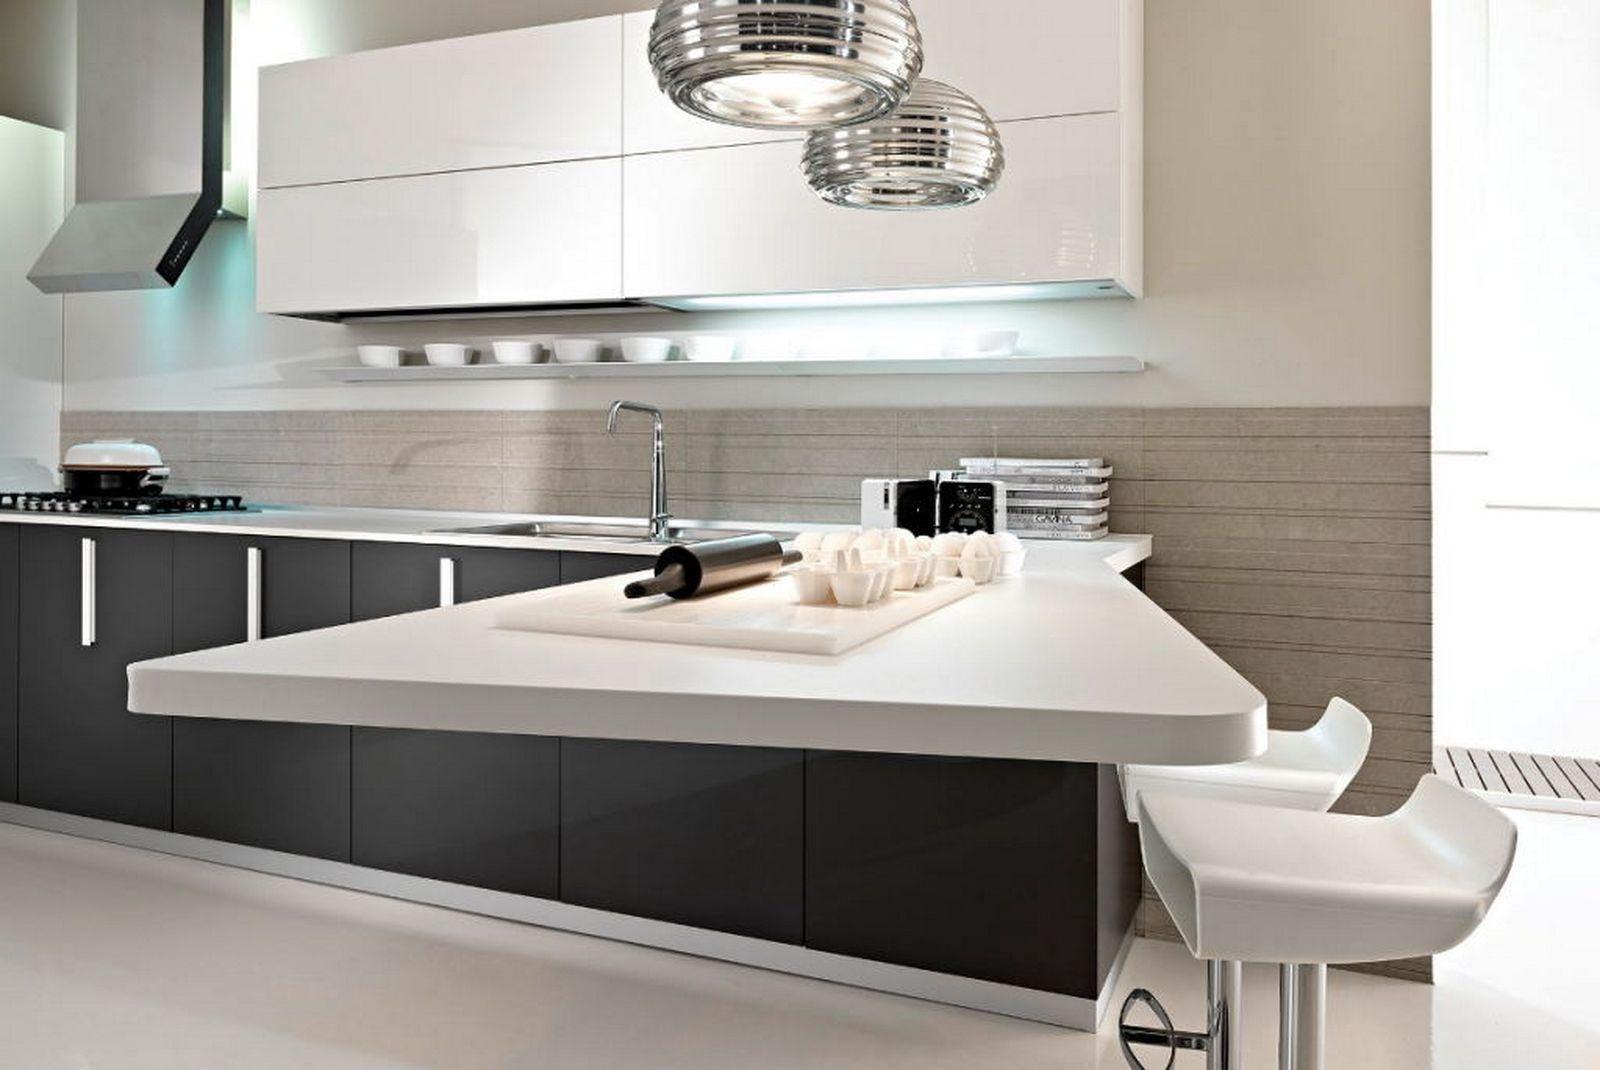 Iluminacion cocinas modernas post lmparas colgantes sobre - Iluminacion cocinas modernas ...